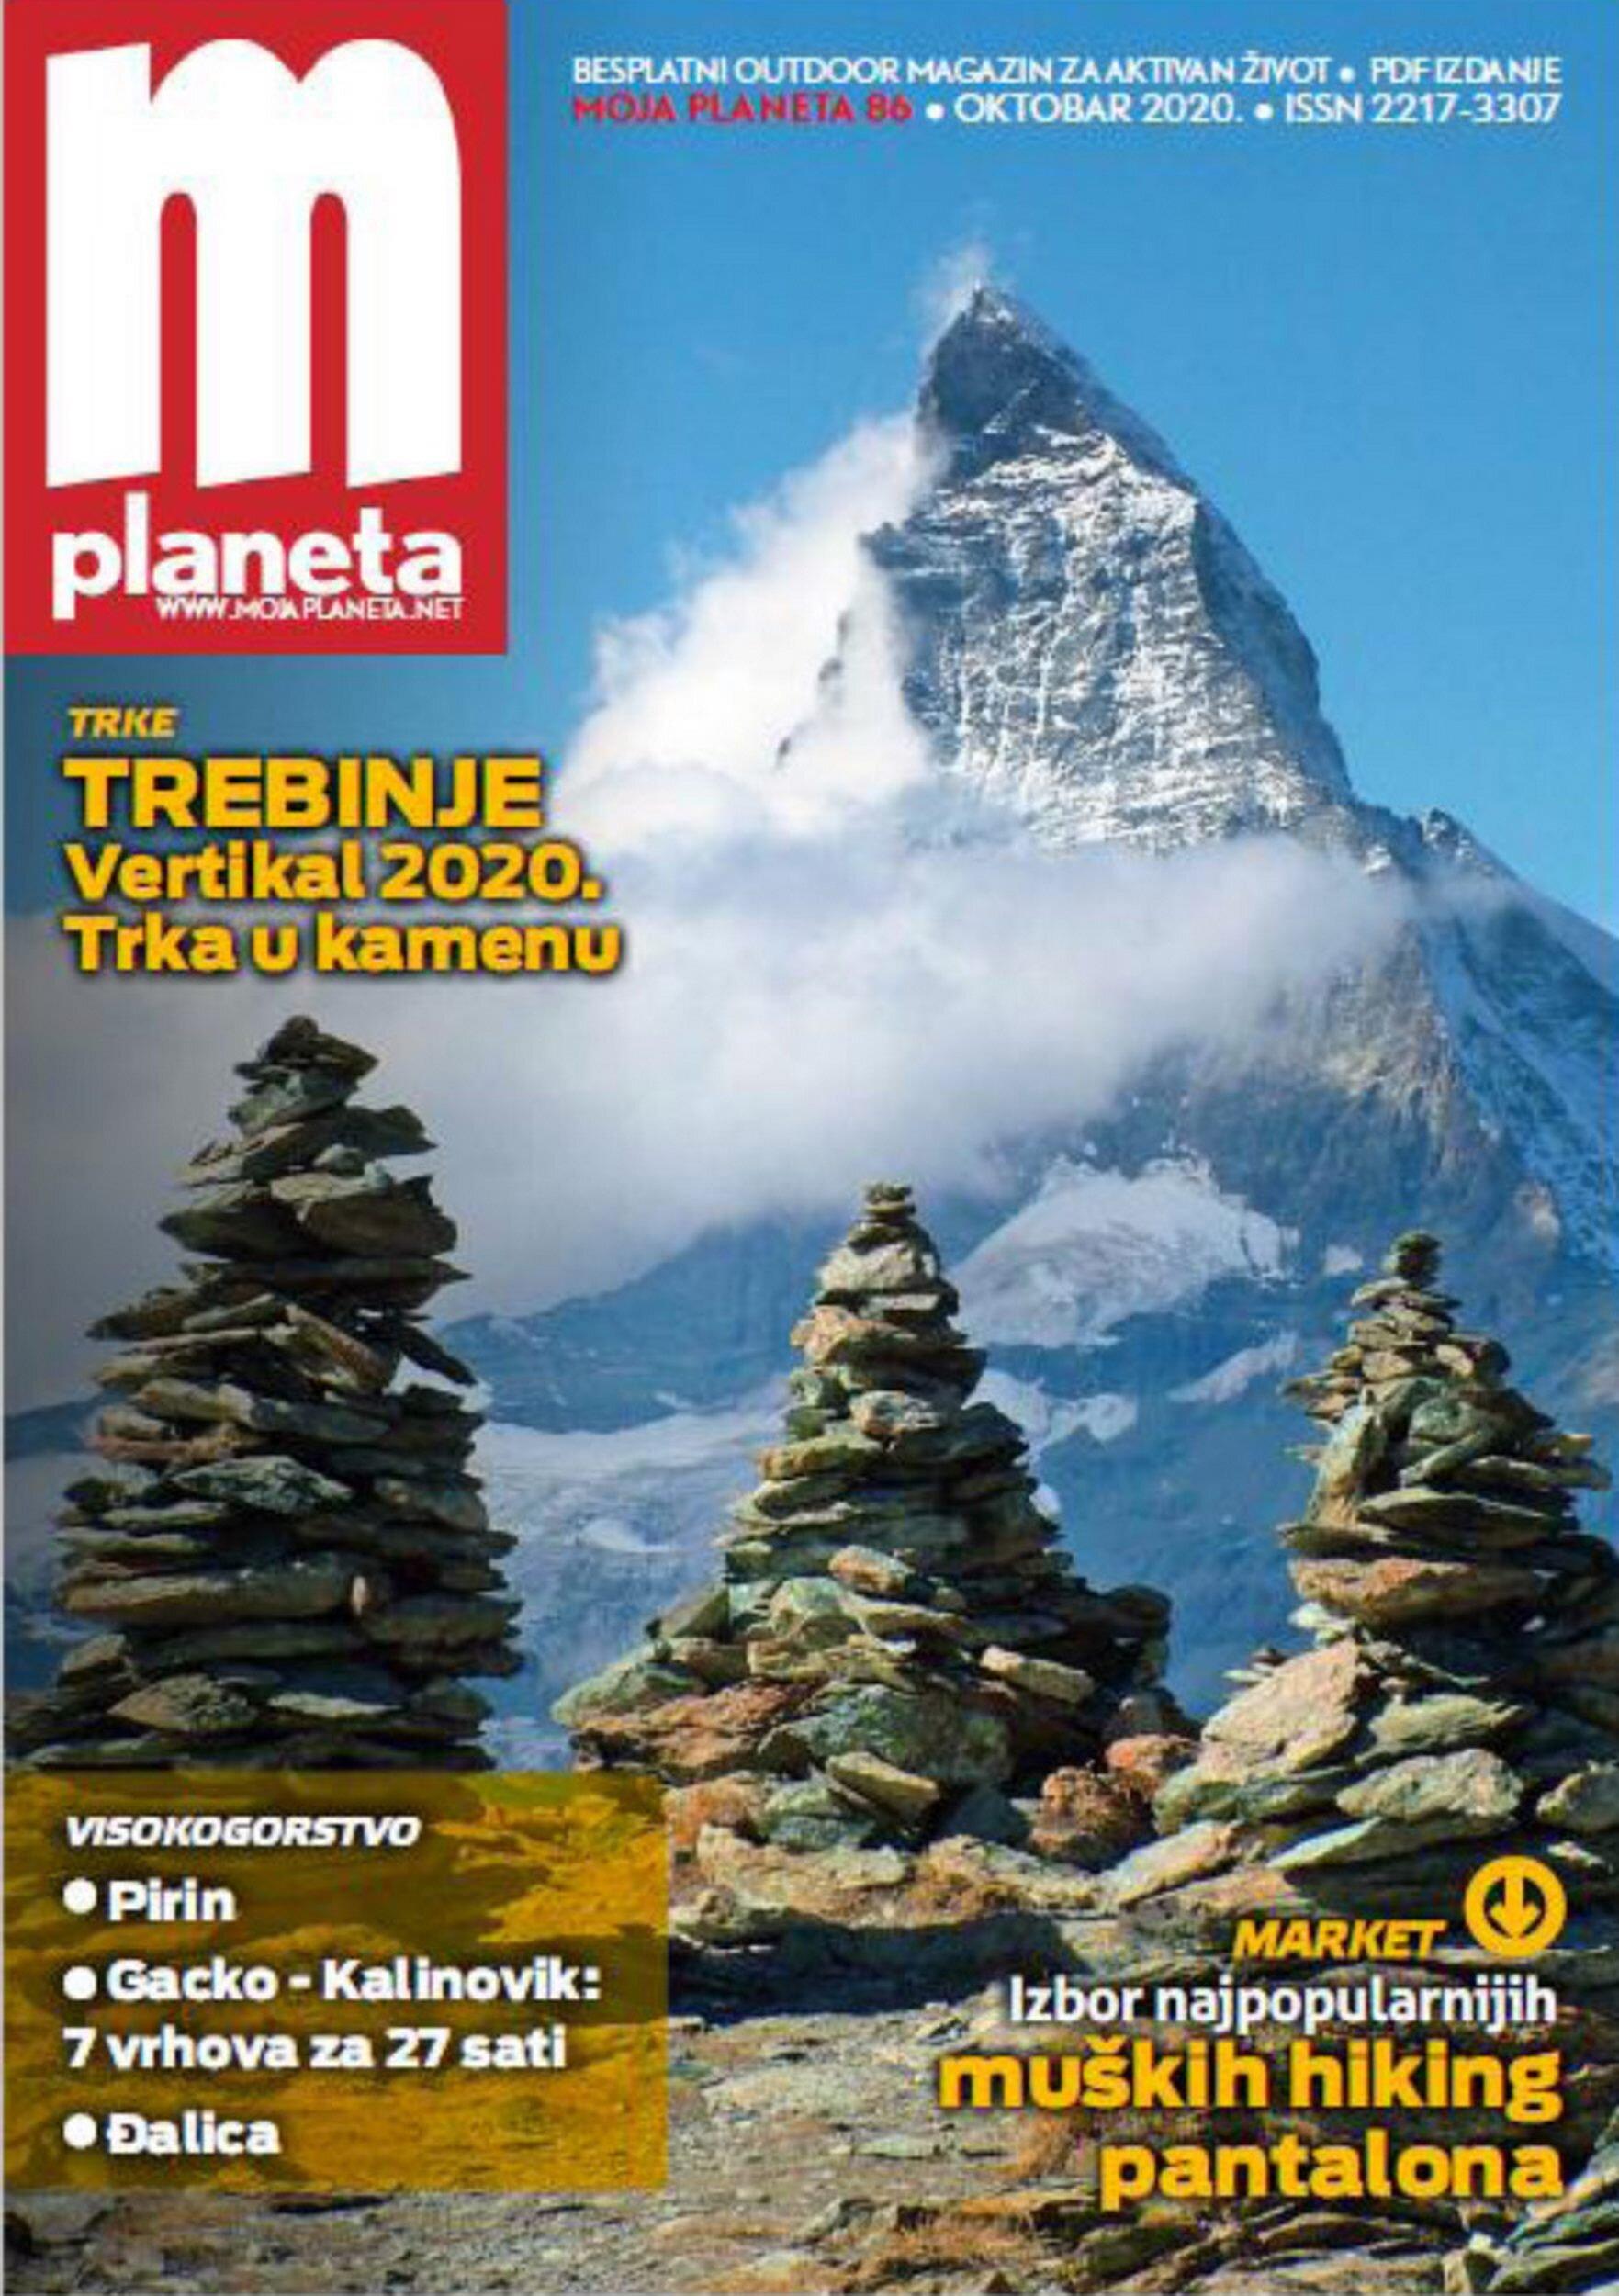 Naslovna strana magazina